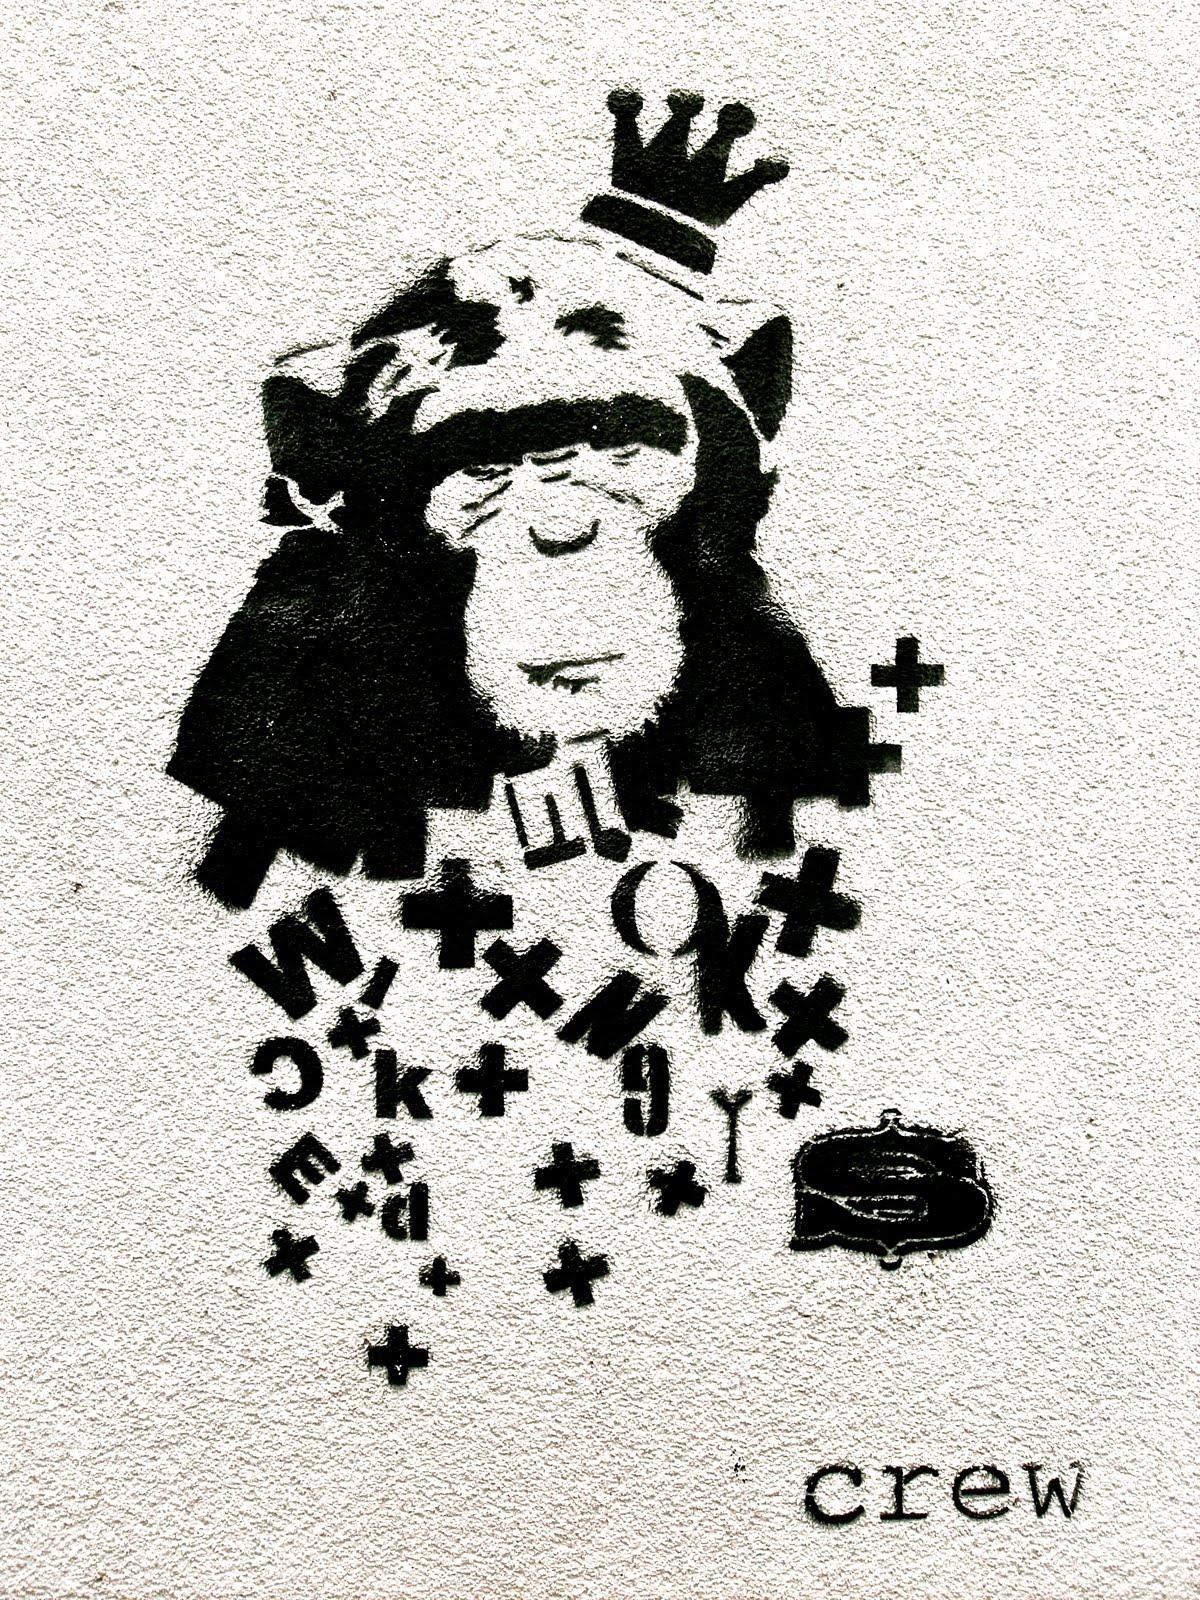 Graffiti Stencils | Fate Loves the Fearless  Graffiti Stenci...